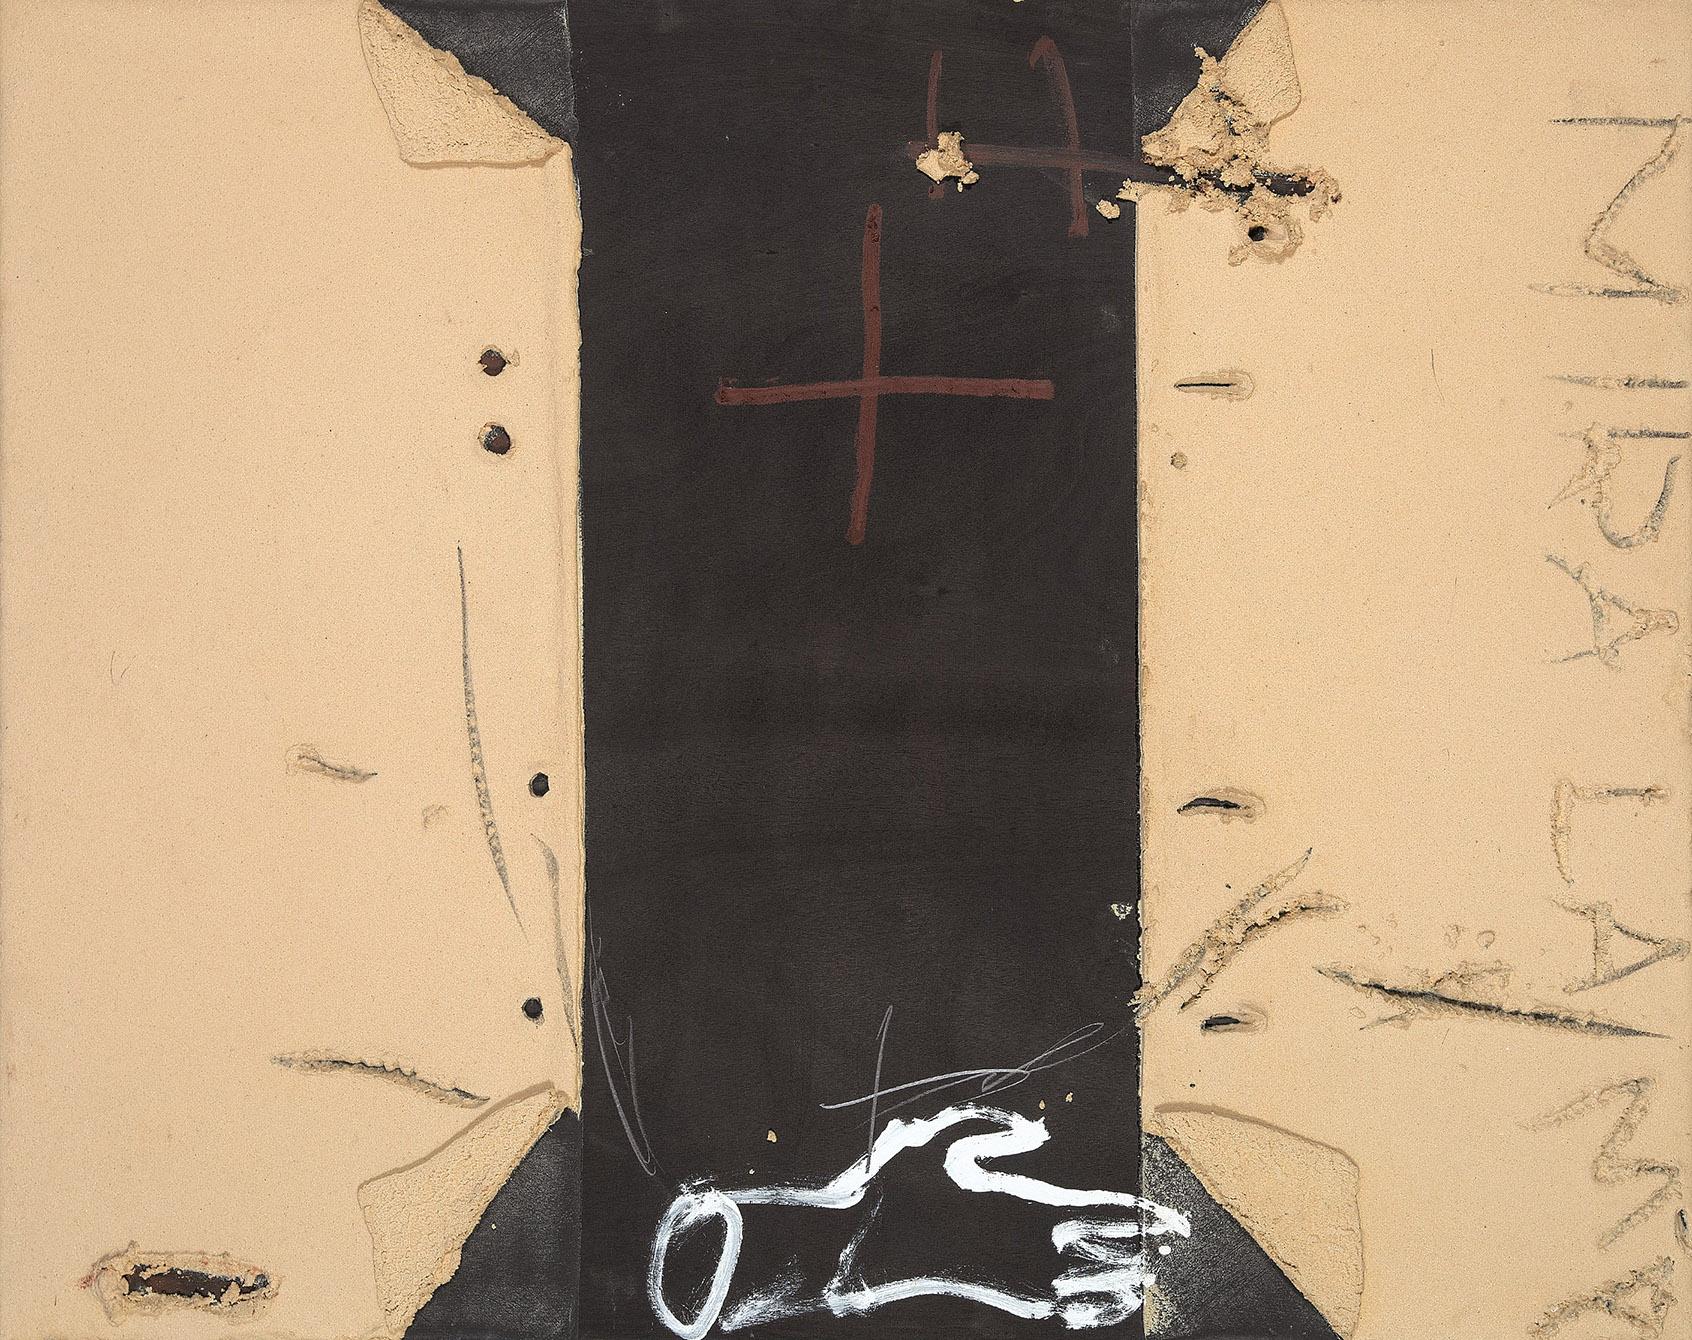 Antoni Tàpies. Má sobre negre, 1998. Salida: 210.000 euros. Remate: 230.000 euros